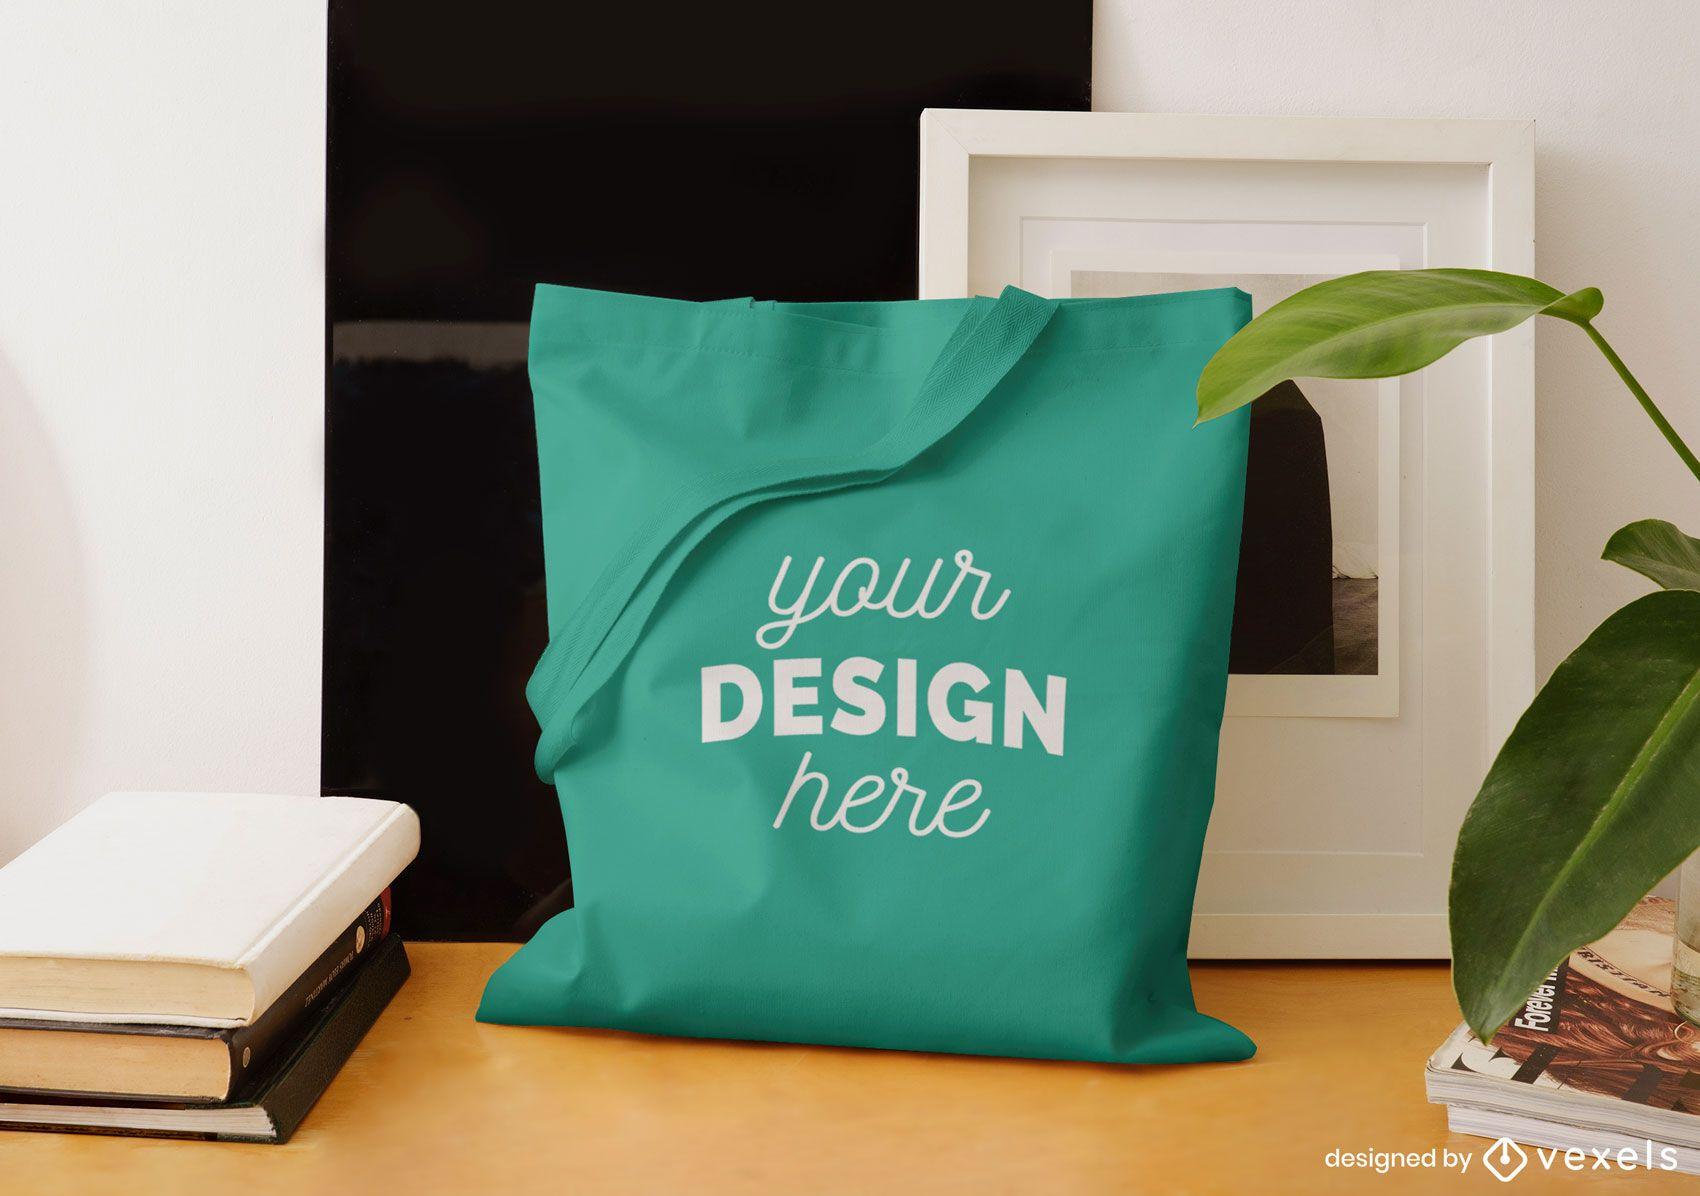 Diseño de maqueta de escritorio de bolso de mano